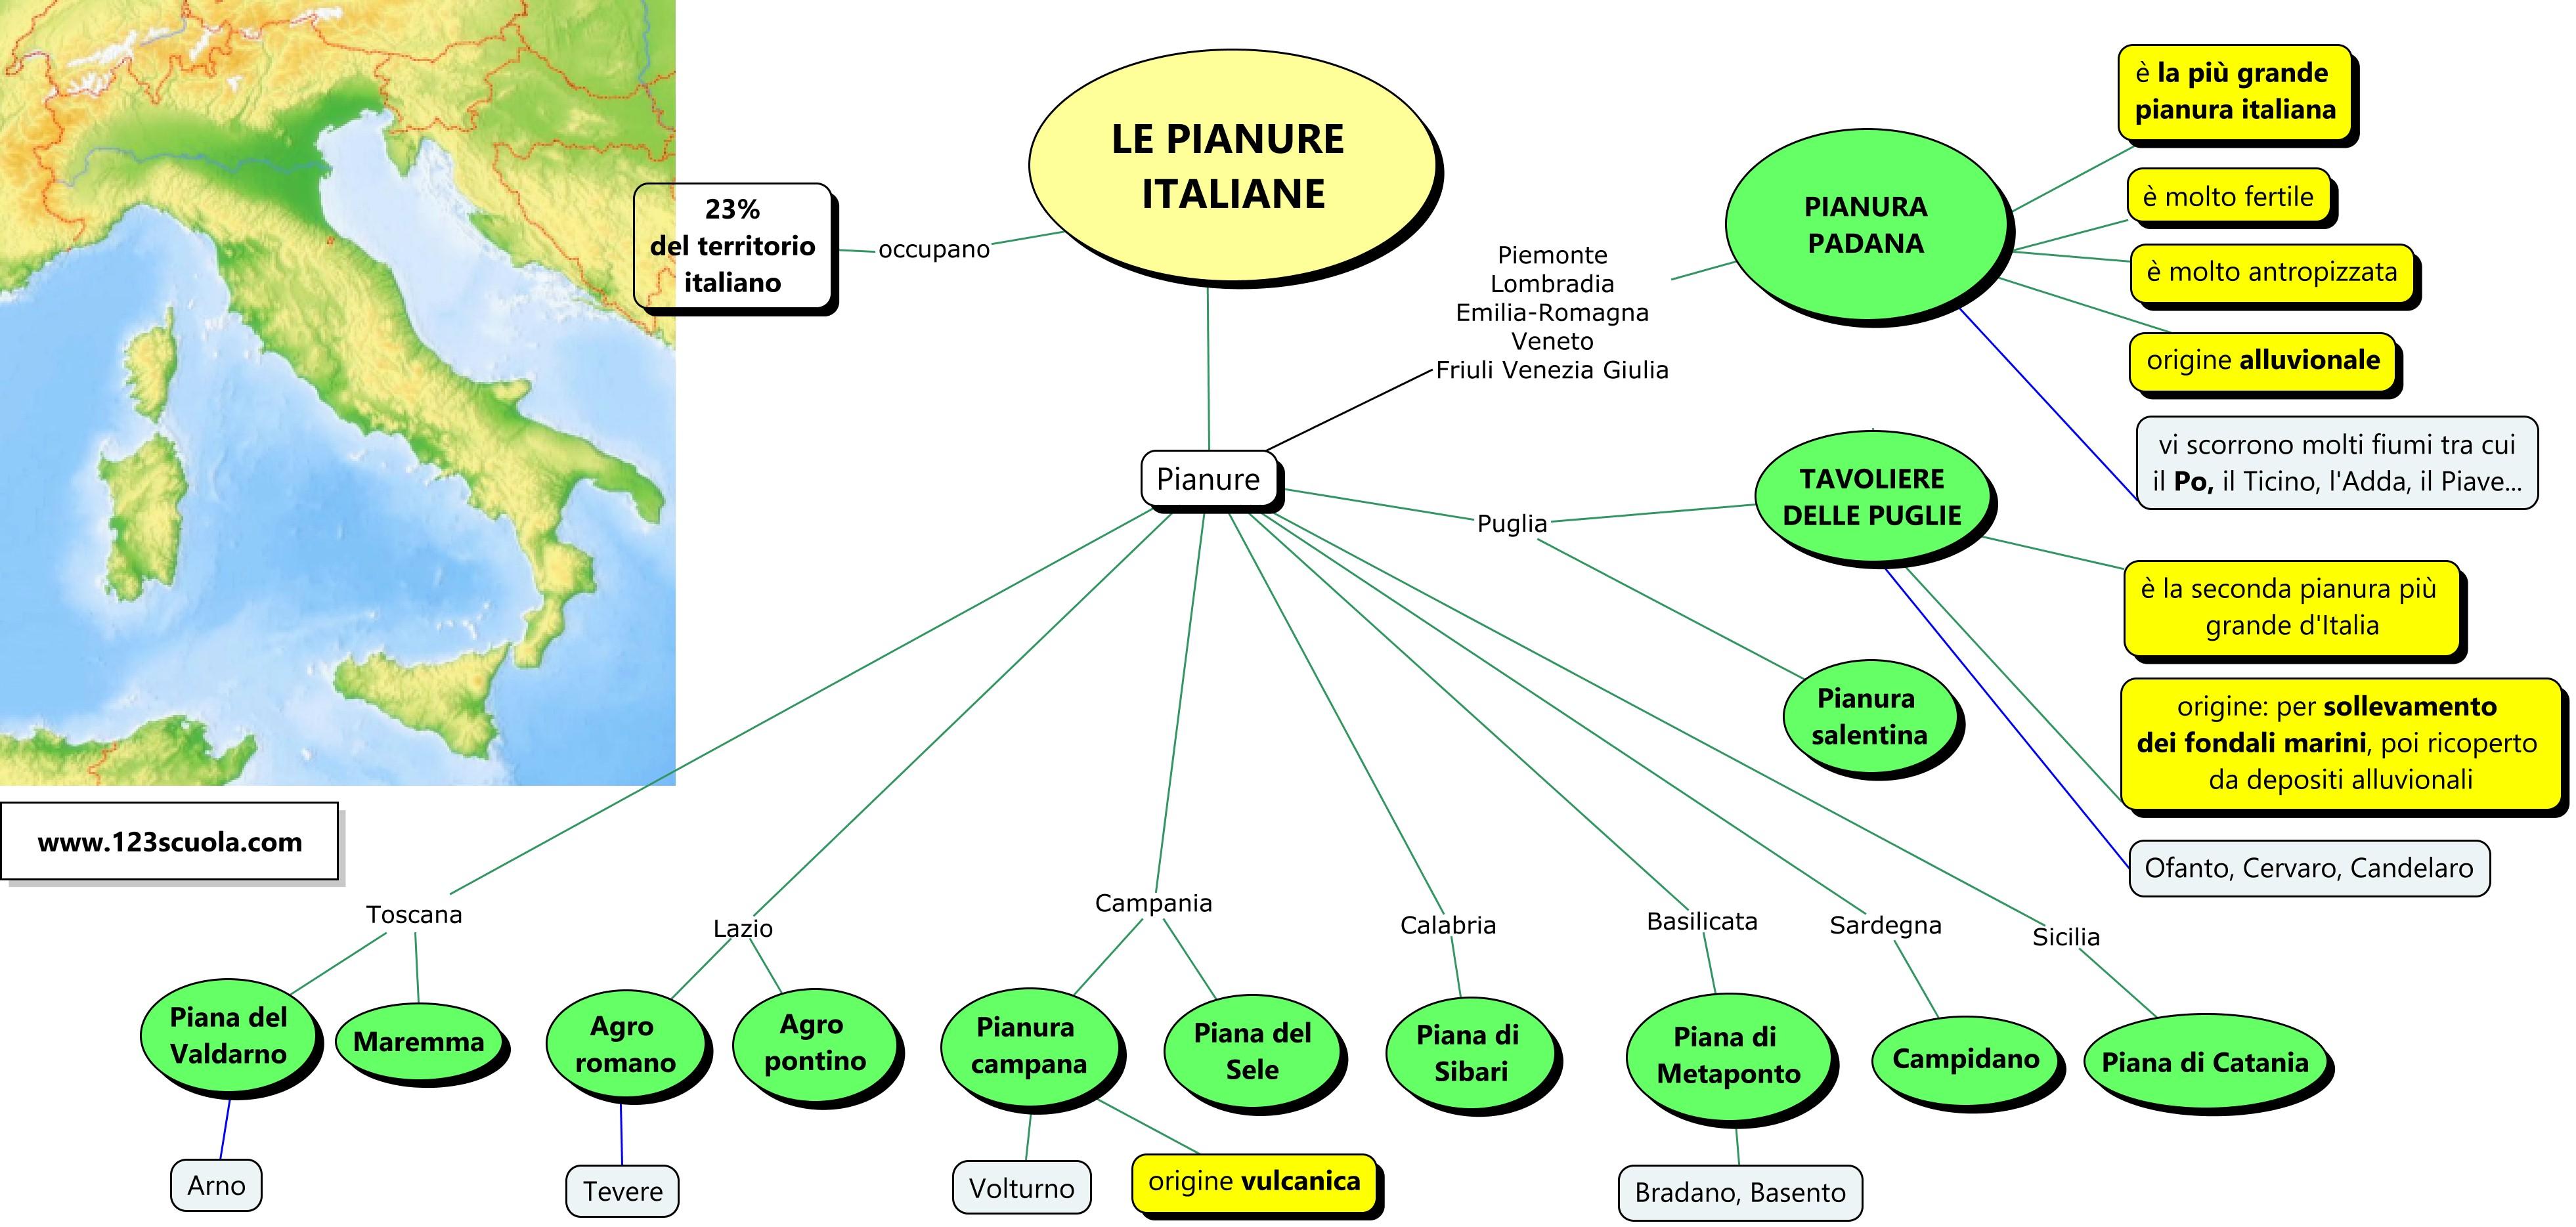 Mappa concettuale - Le pianure italiane